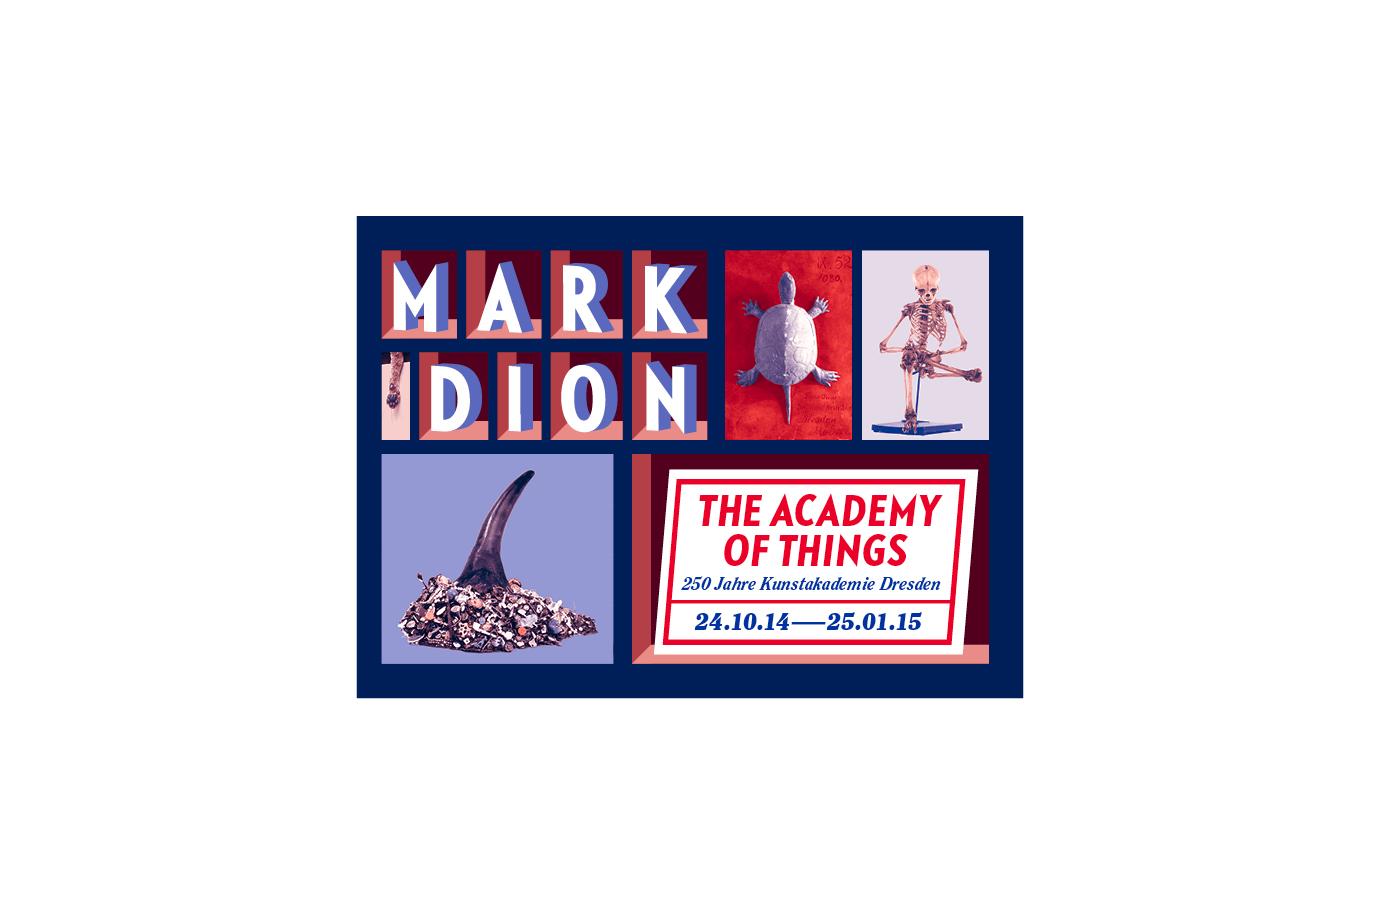 http://e-o-t.de/wordpress/wp-content/uploads/2017/10/2014_eot-MarkDion-Identity-03.jpg